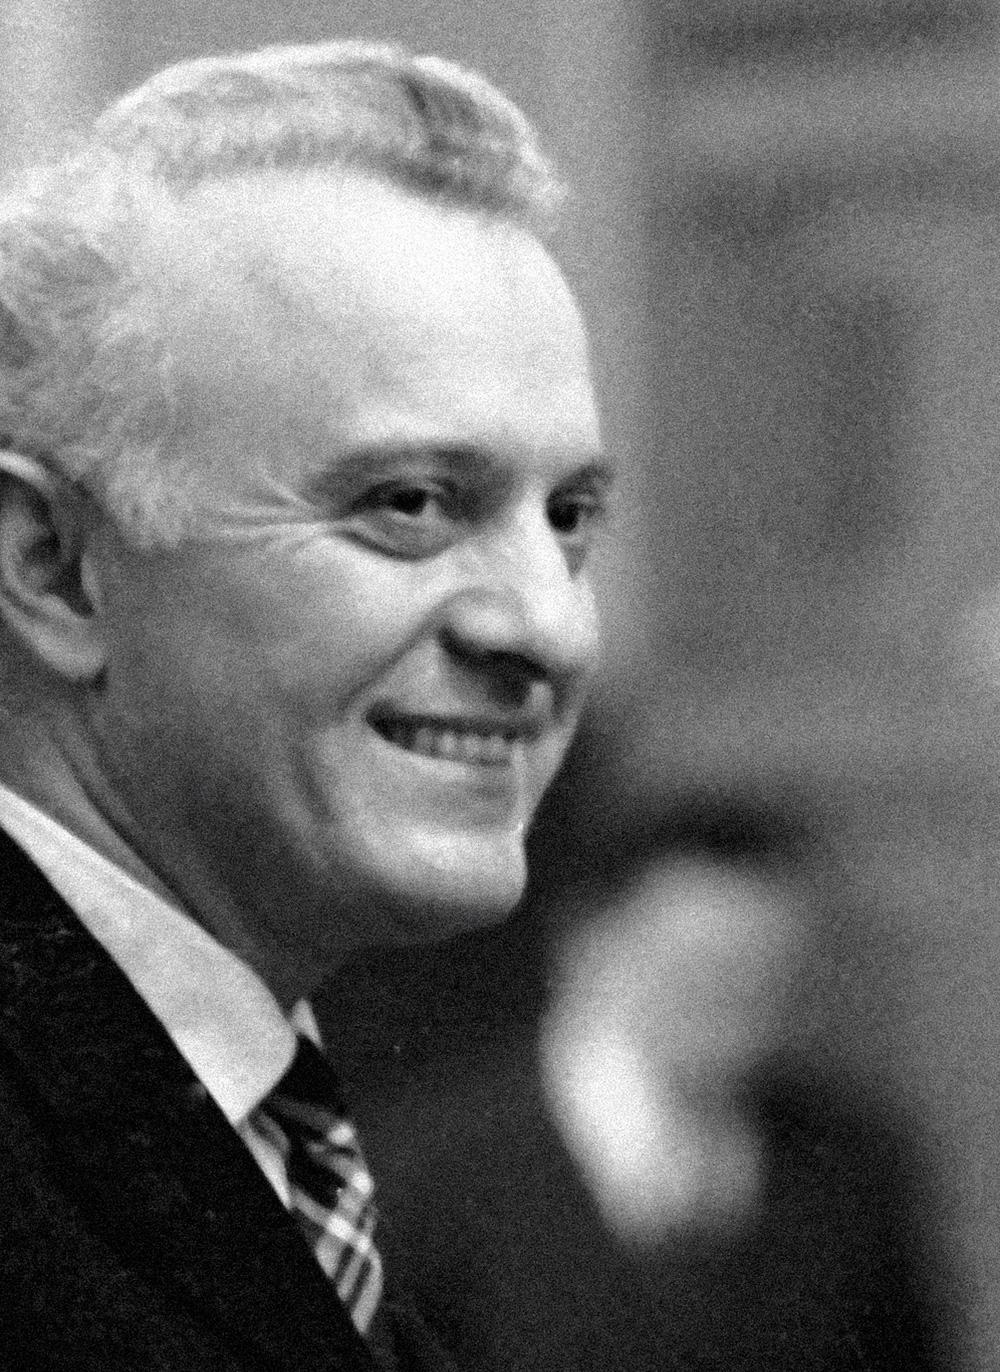 Эдуард Шеварднадзе. 1972 г.